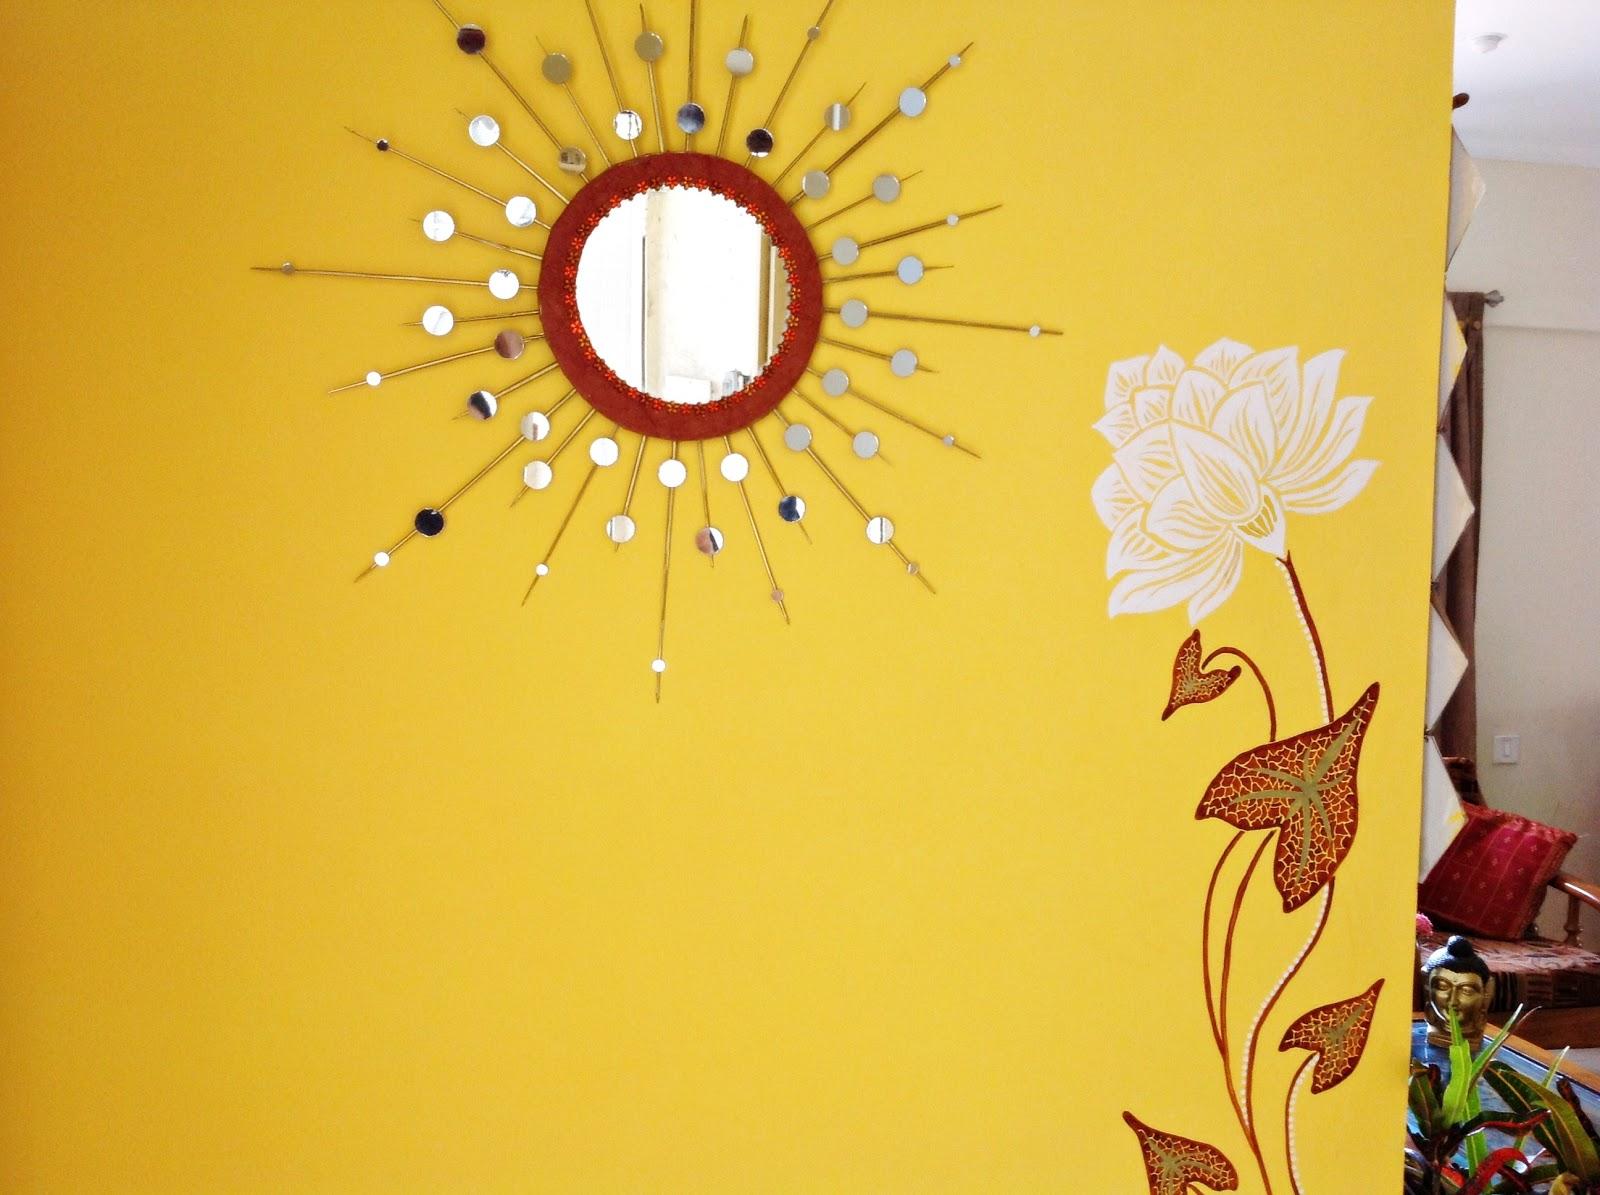 Design Decor & Disha   An Indian Design & Decor Blog: DIY